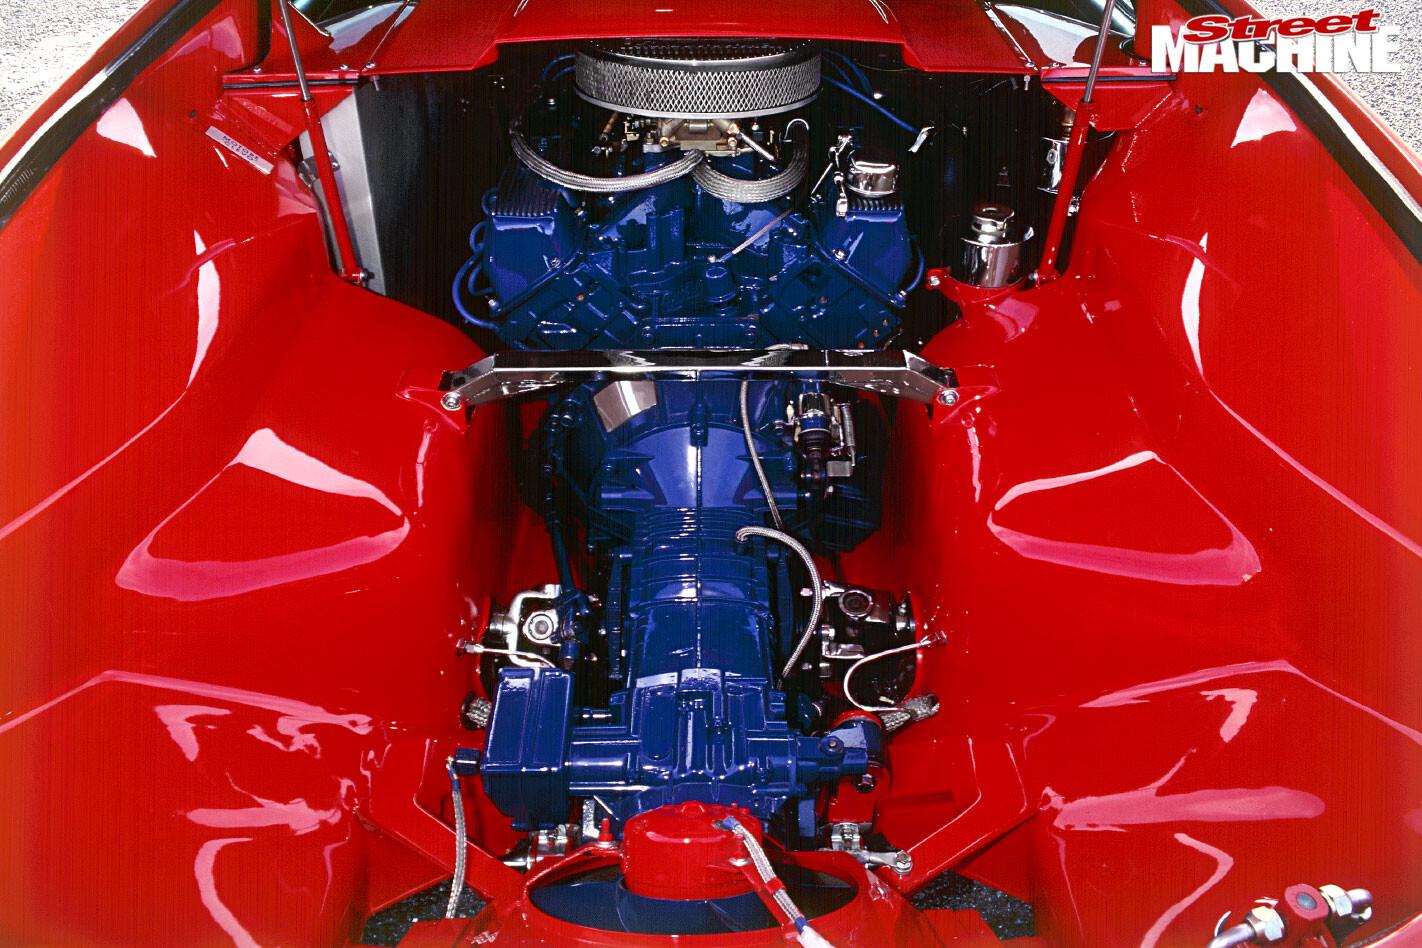 De Tomaso Pantera engine bay